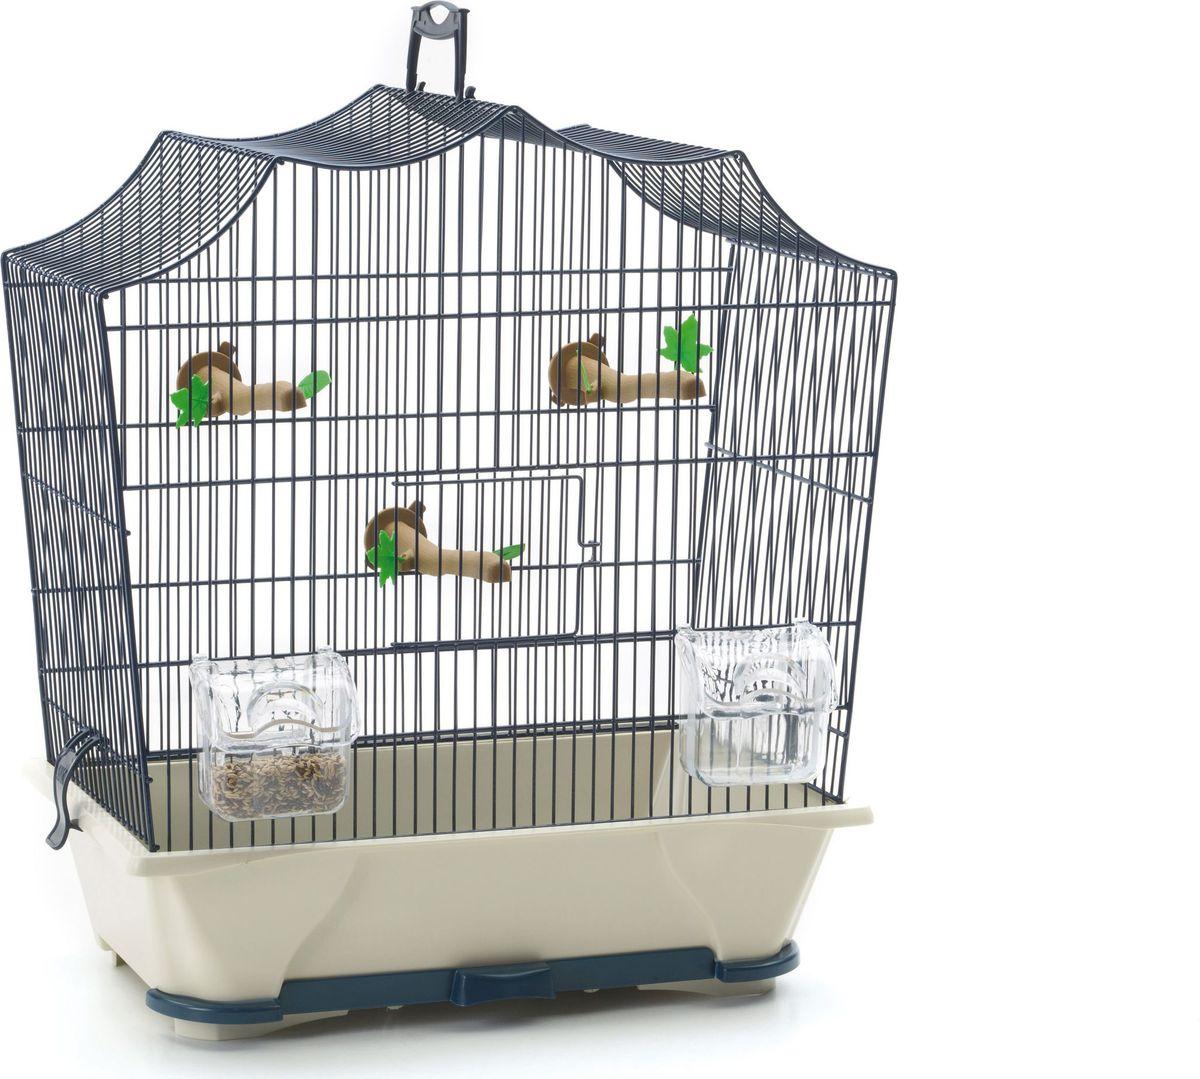 Клетка для птиц Savic  Silvie , цвет: голубой, 43 х 25 х 47 см - Клетки, вольеры, будки